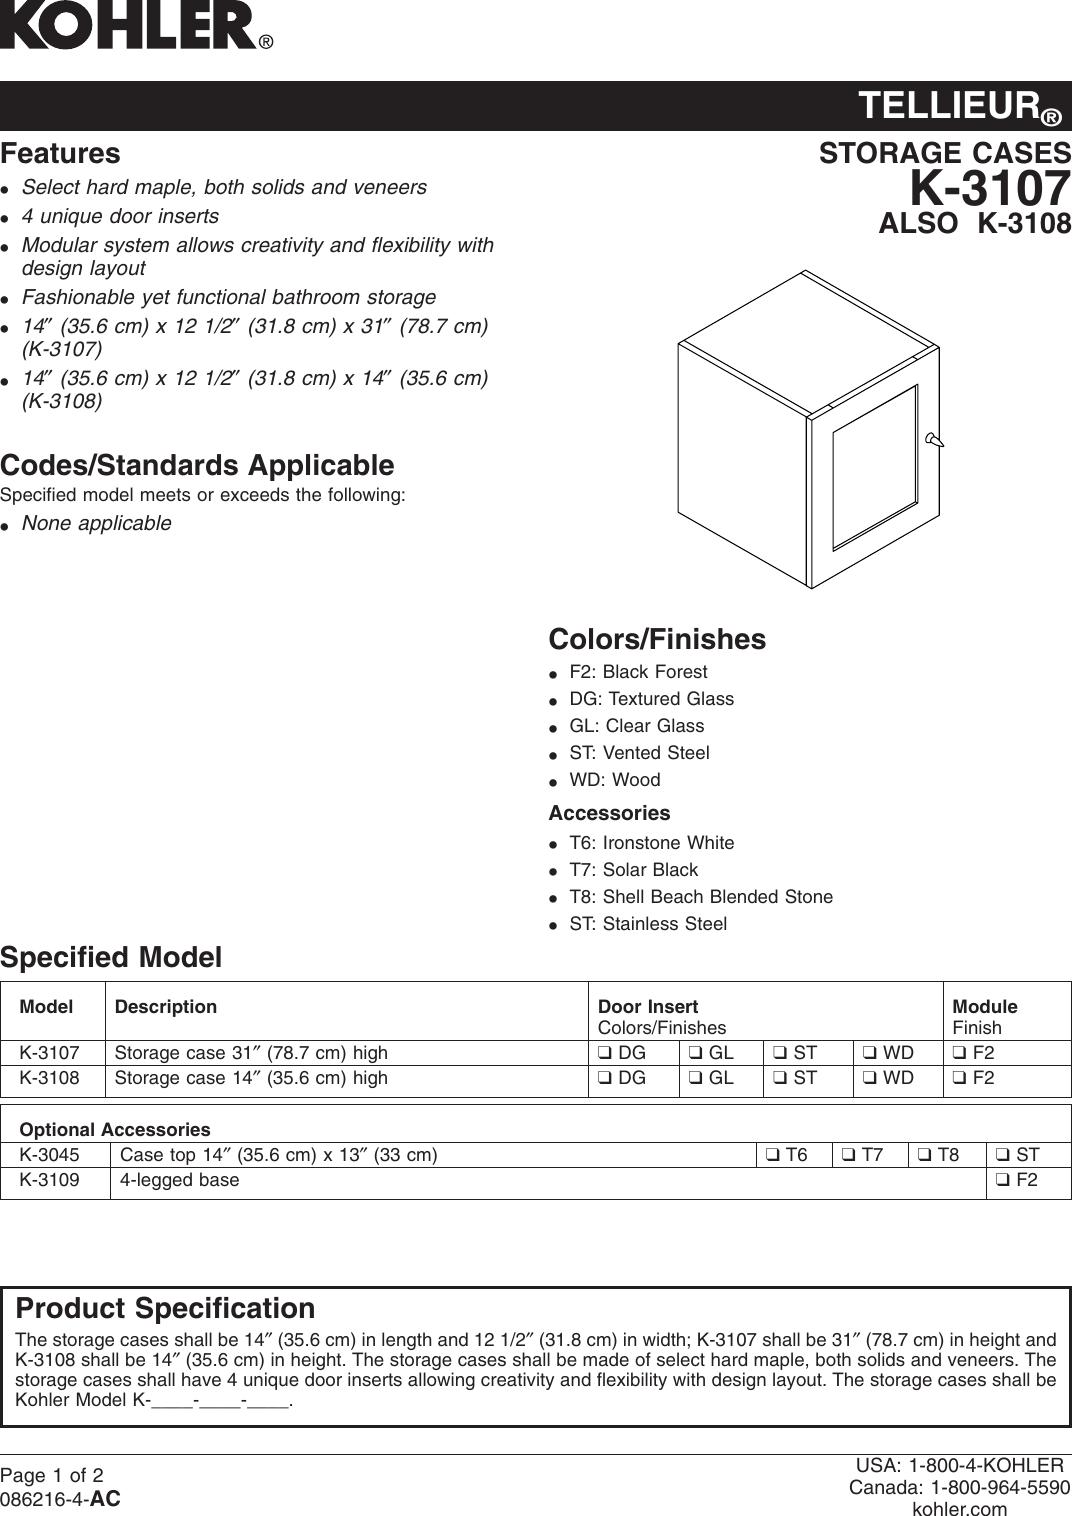 kohler k 3107 users manual no job name rh usermanual wiki User Manual User Manual